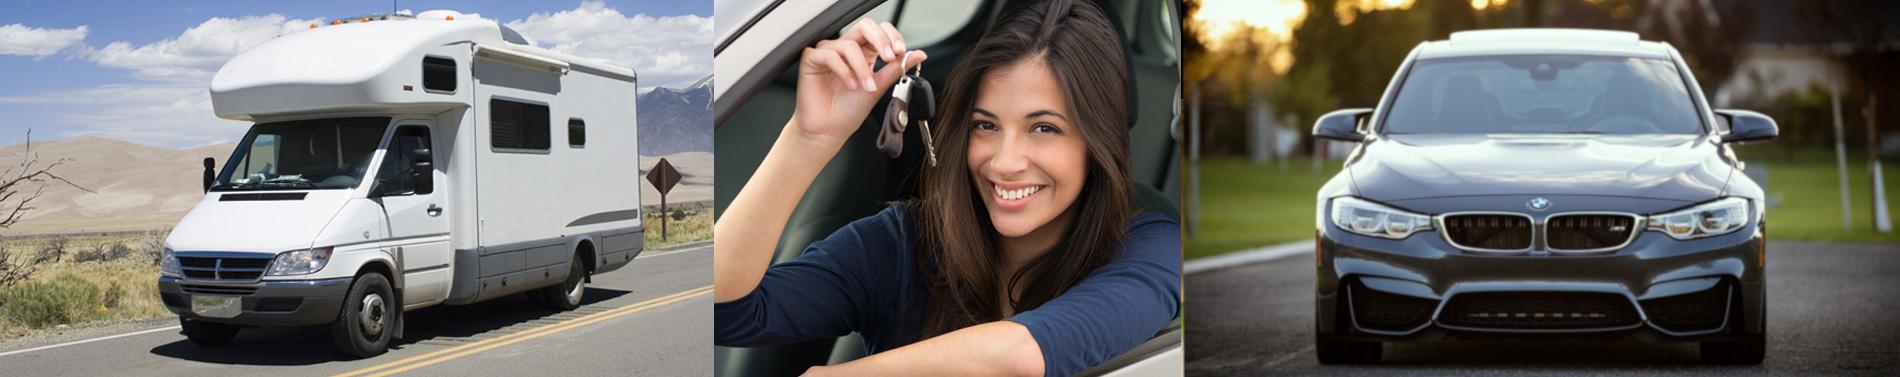 Achat véhicule : auto, moto, caravane